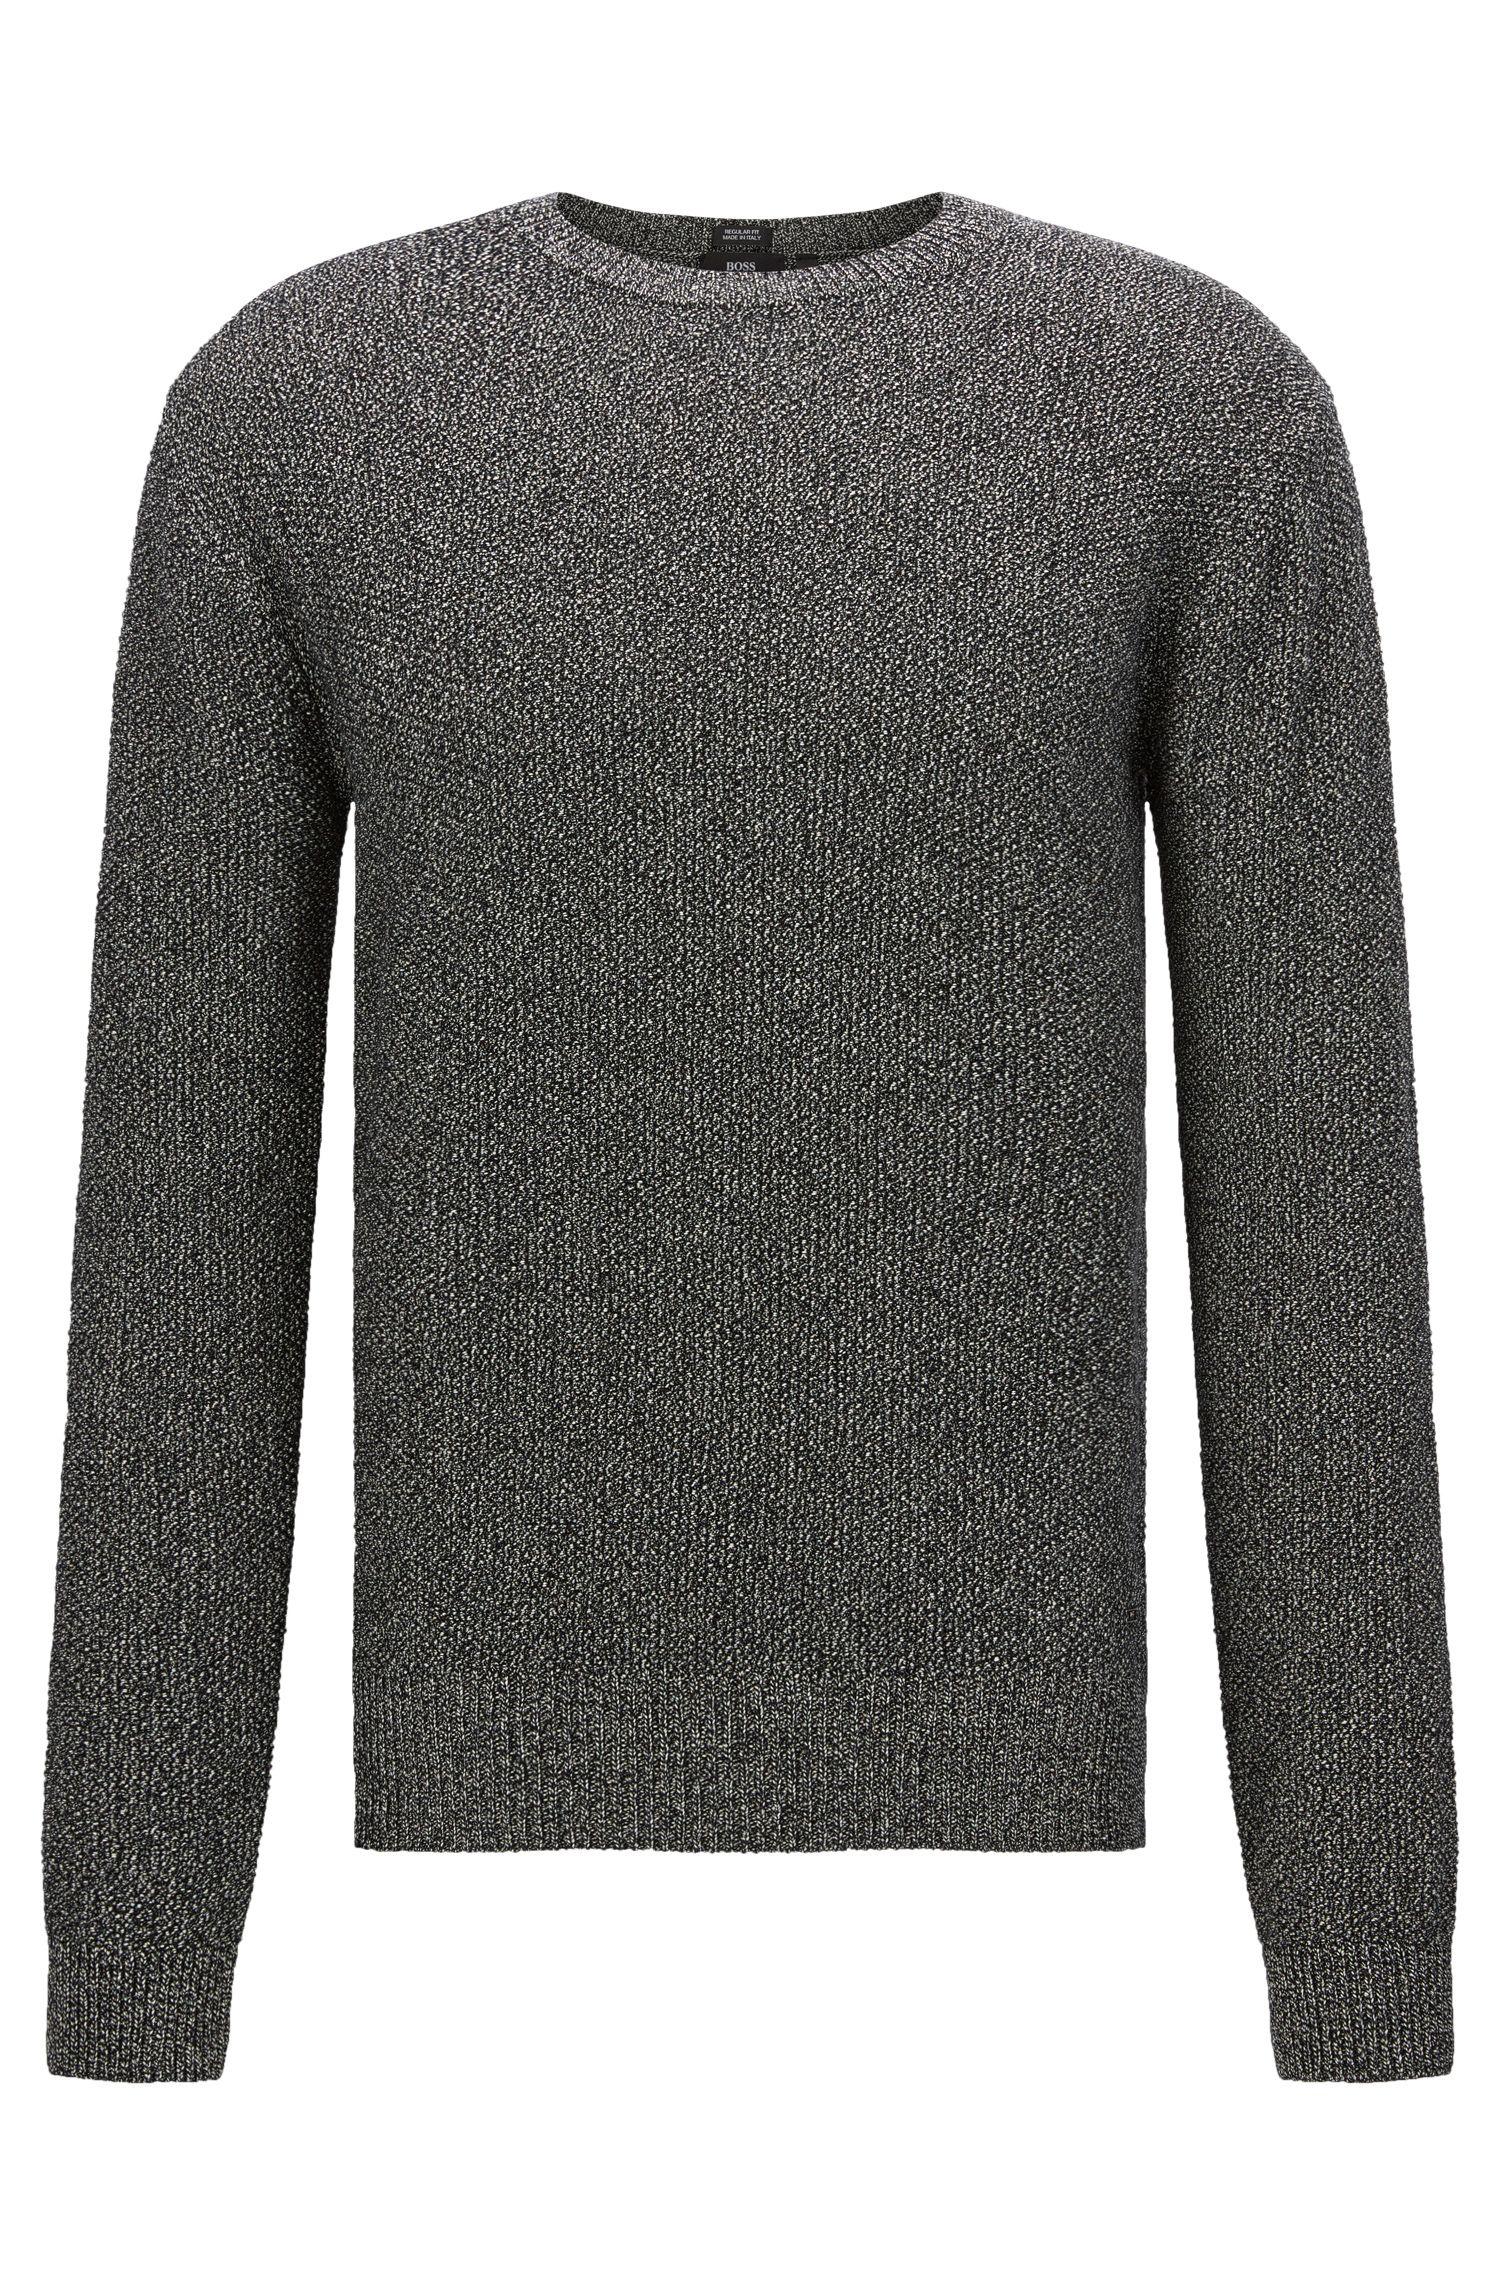 Melierter Regular-Fit Pullover aus Baumwolle: 'Orsino'